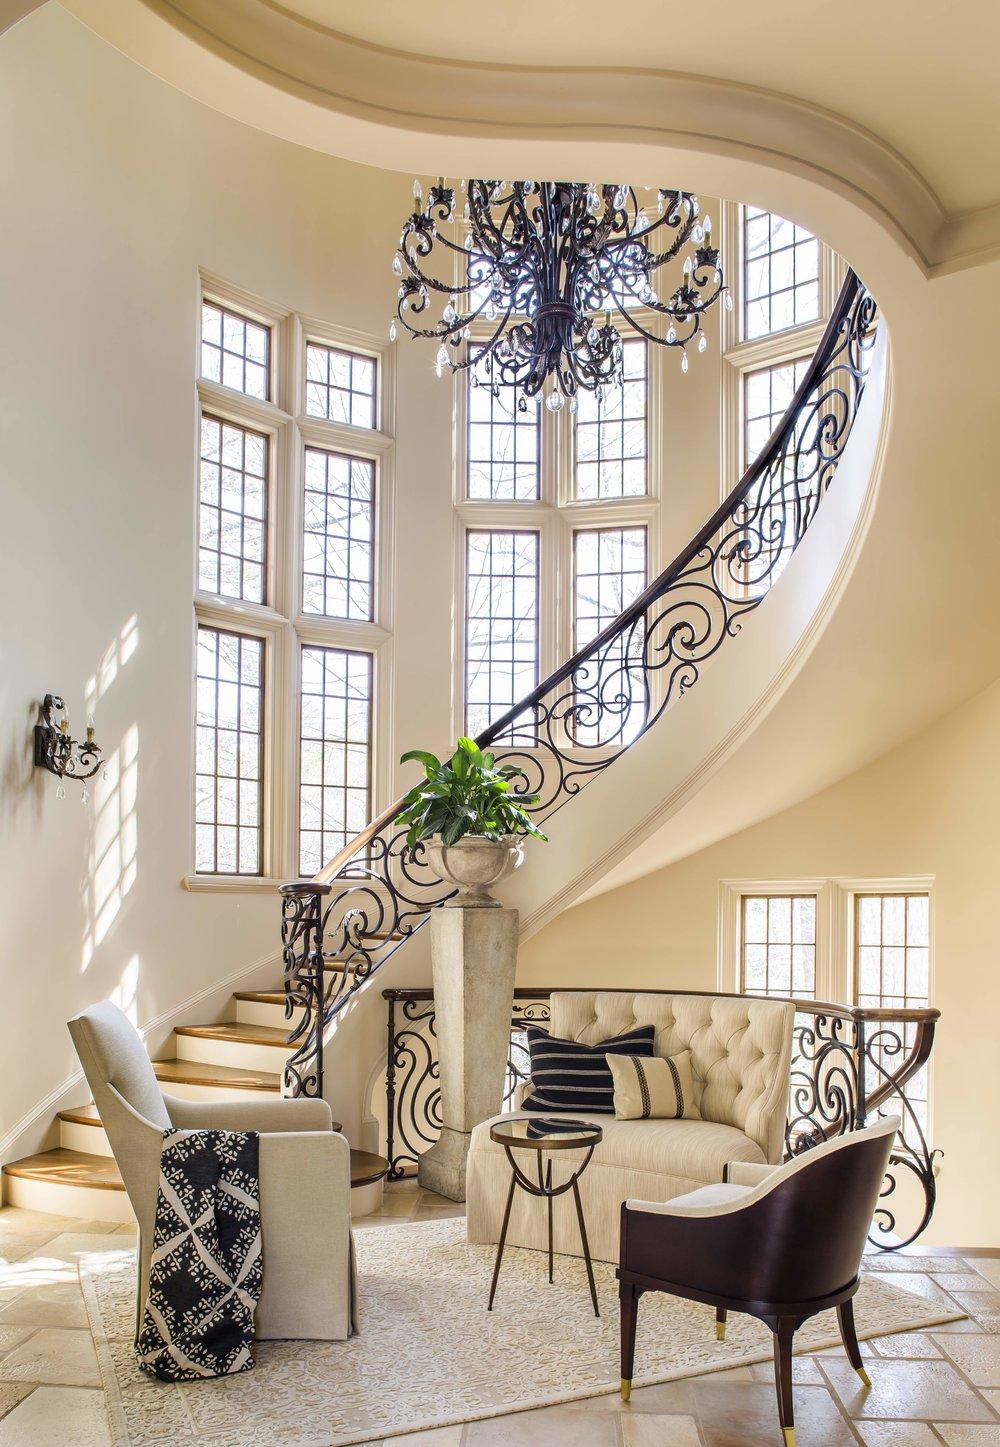 MDG - Foyer - Staircase.JPG